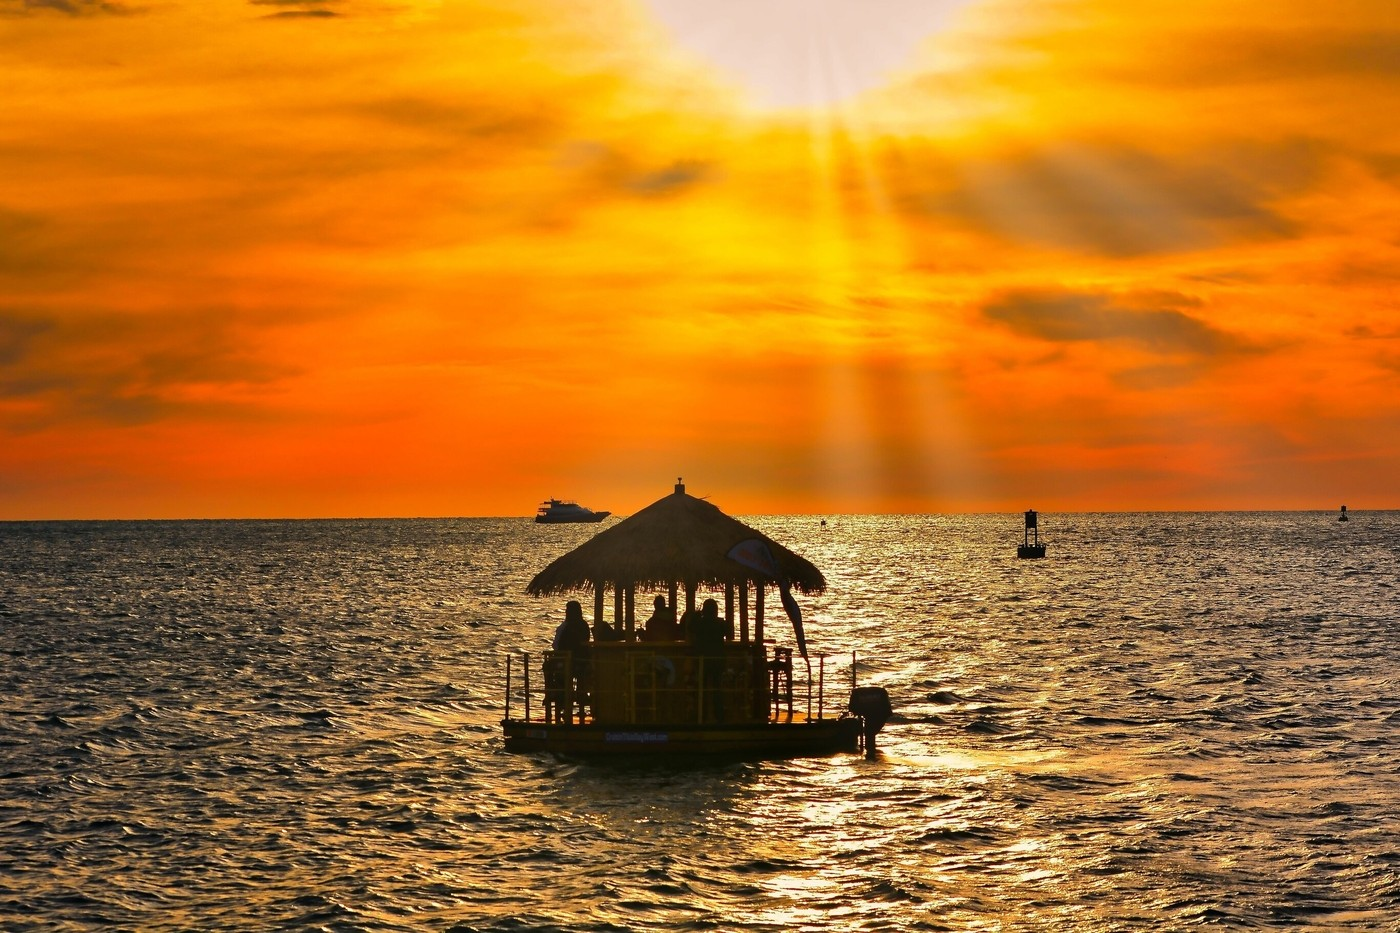 Sunset Cruise Tiki Bar